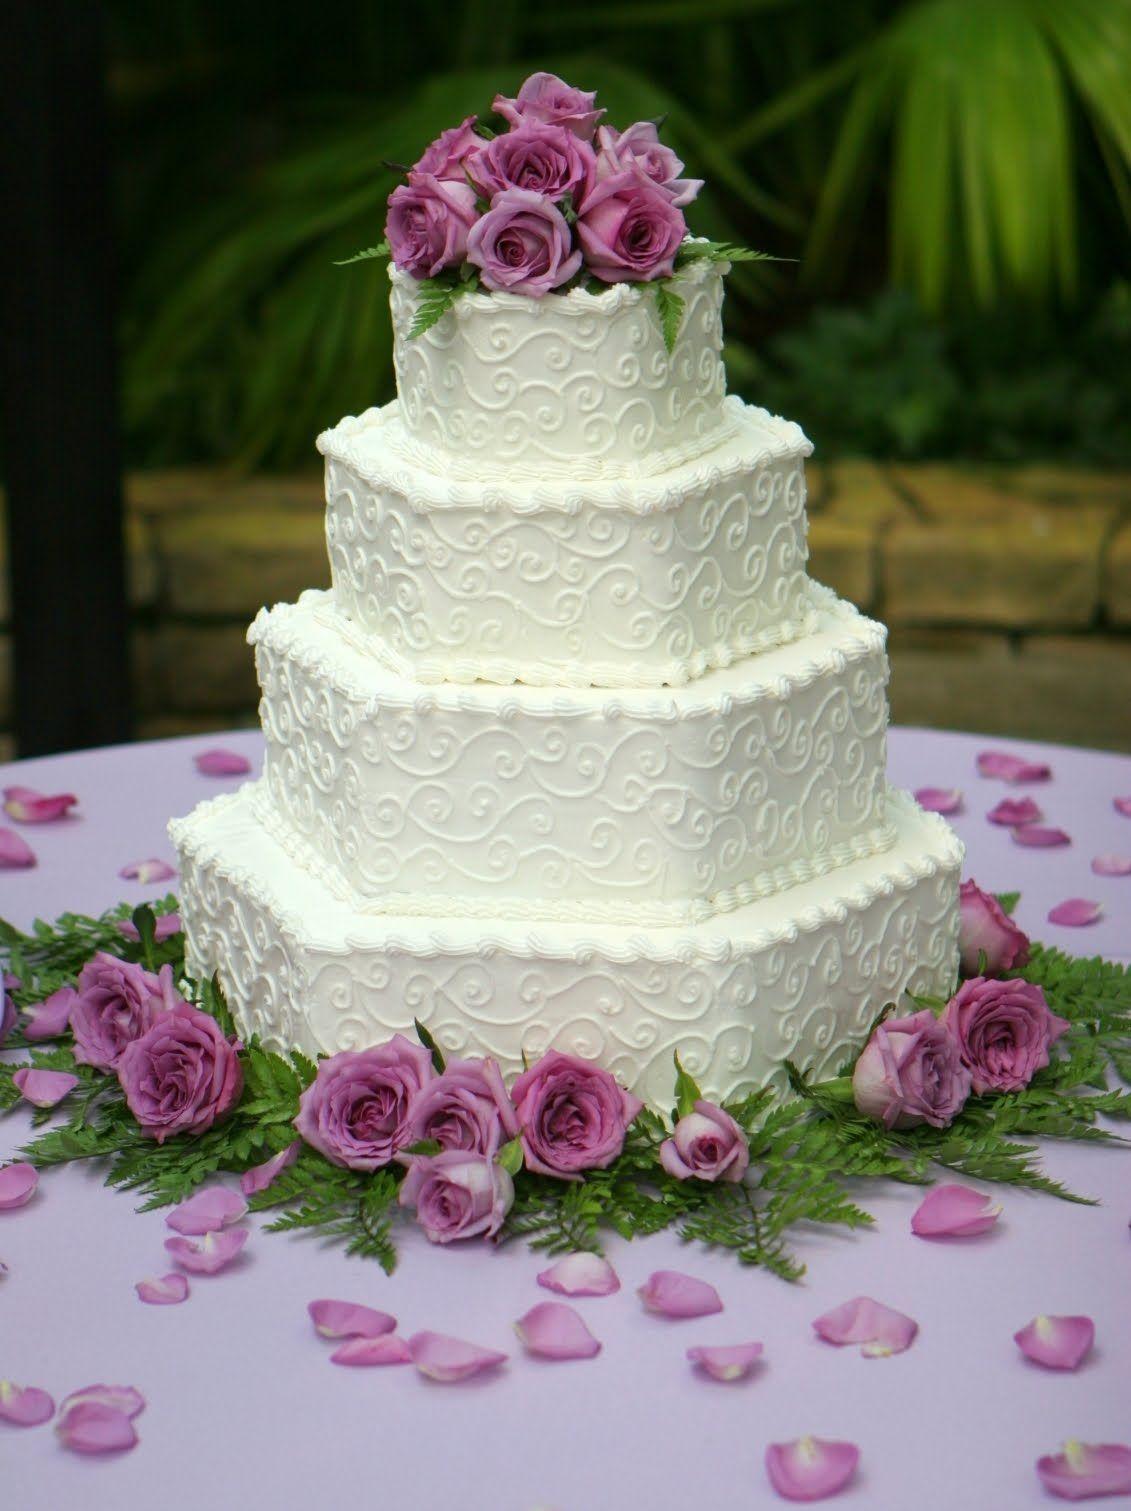 Wedding Cake Without Fondant   Google Search